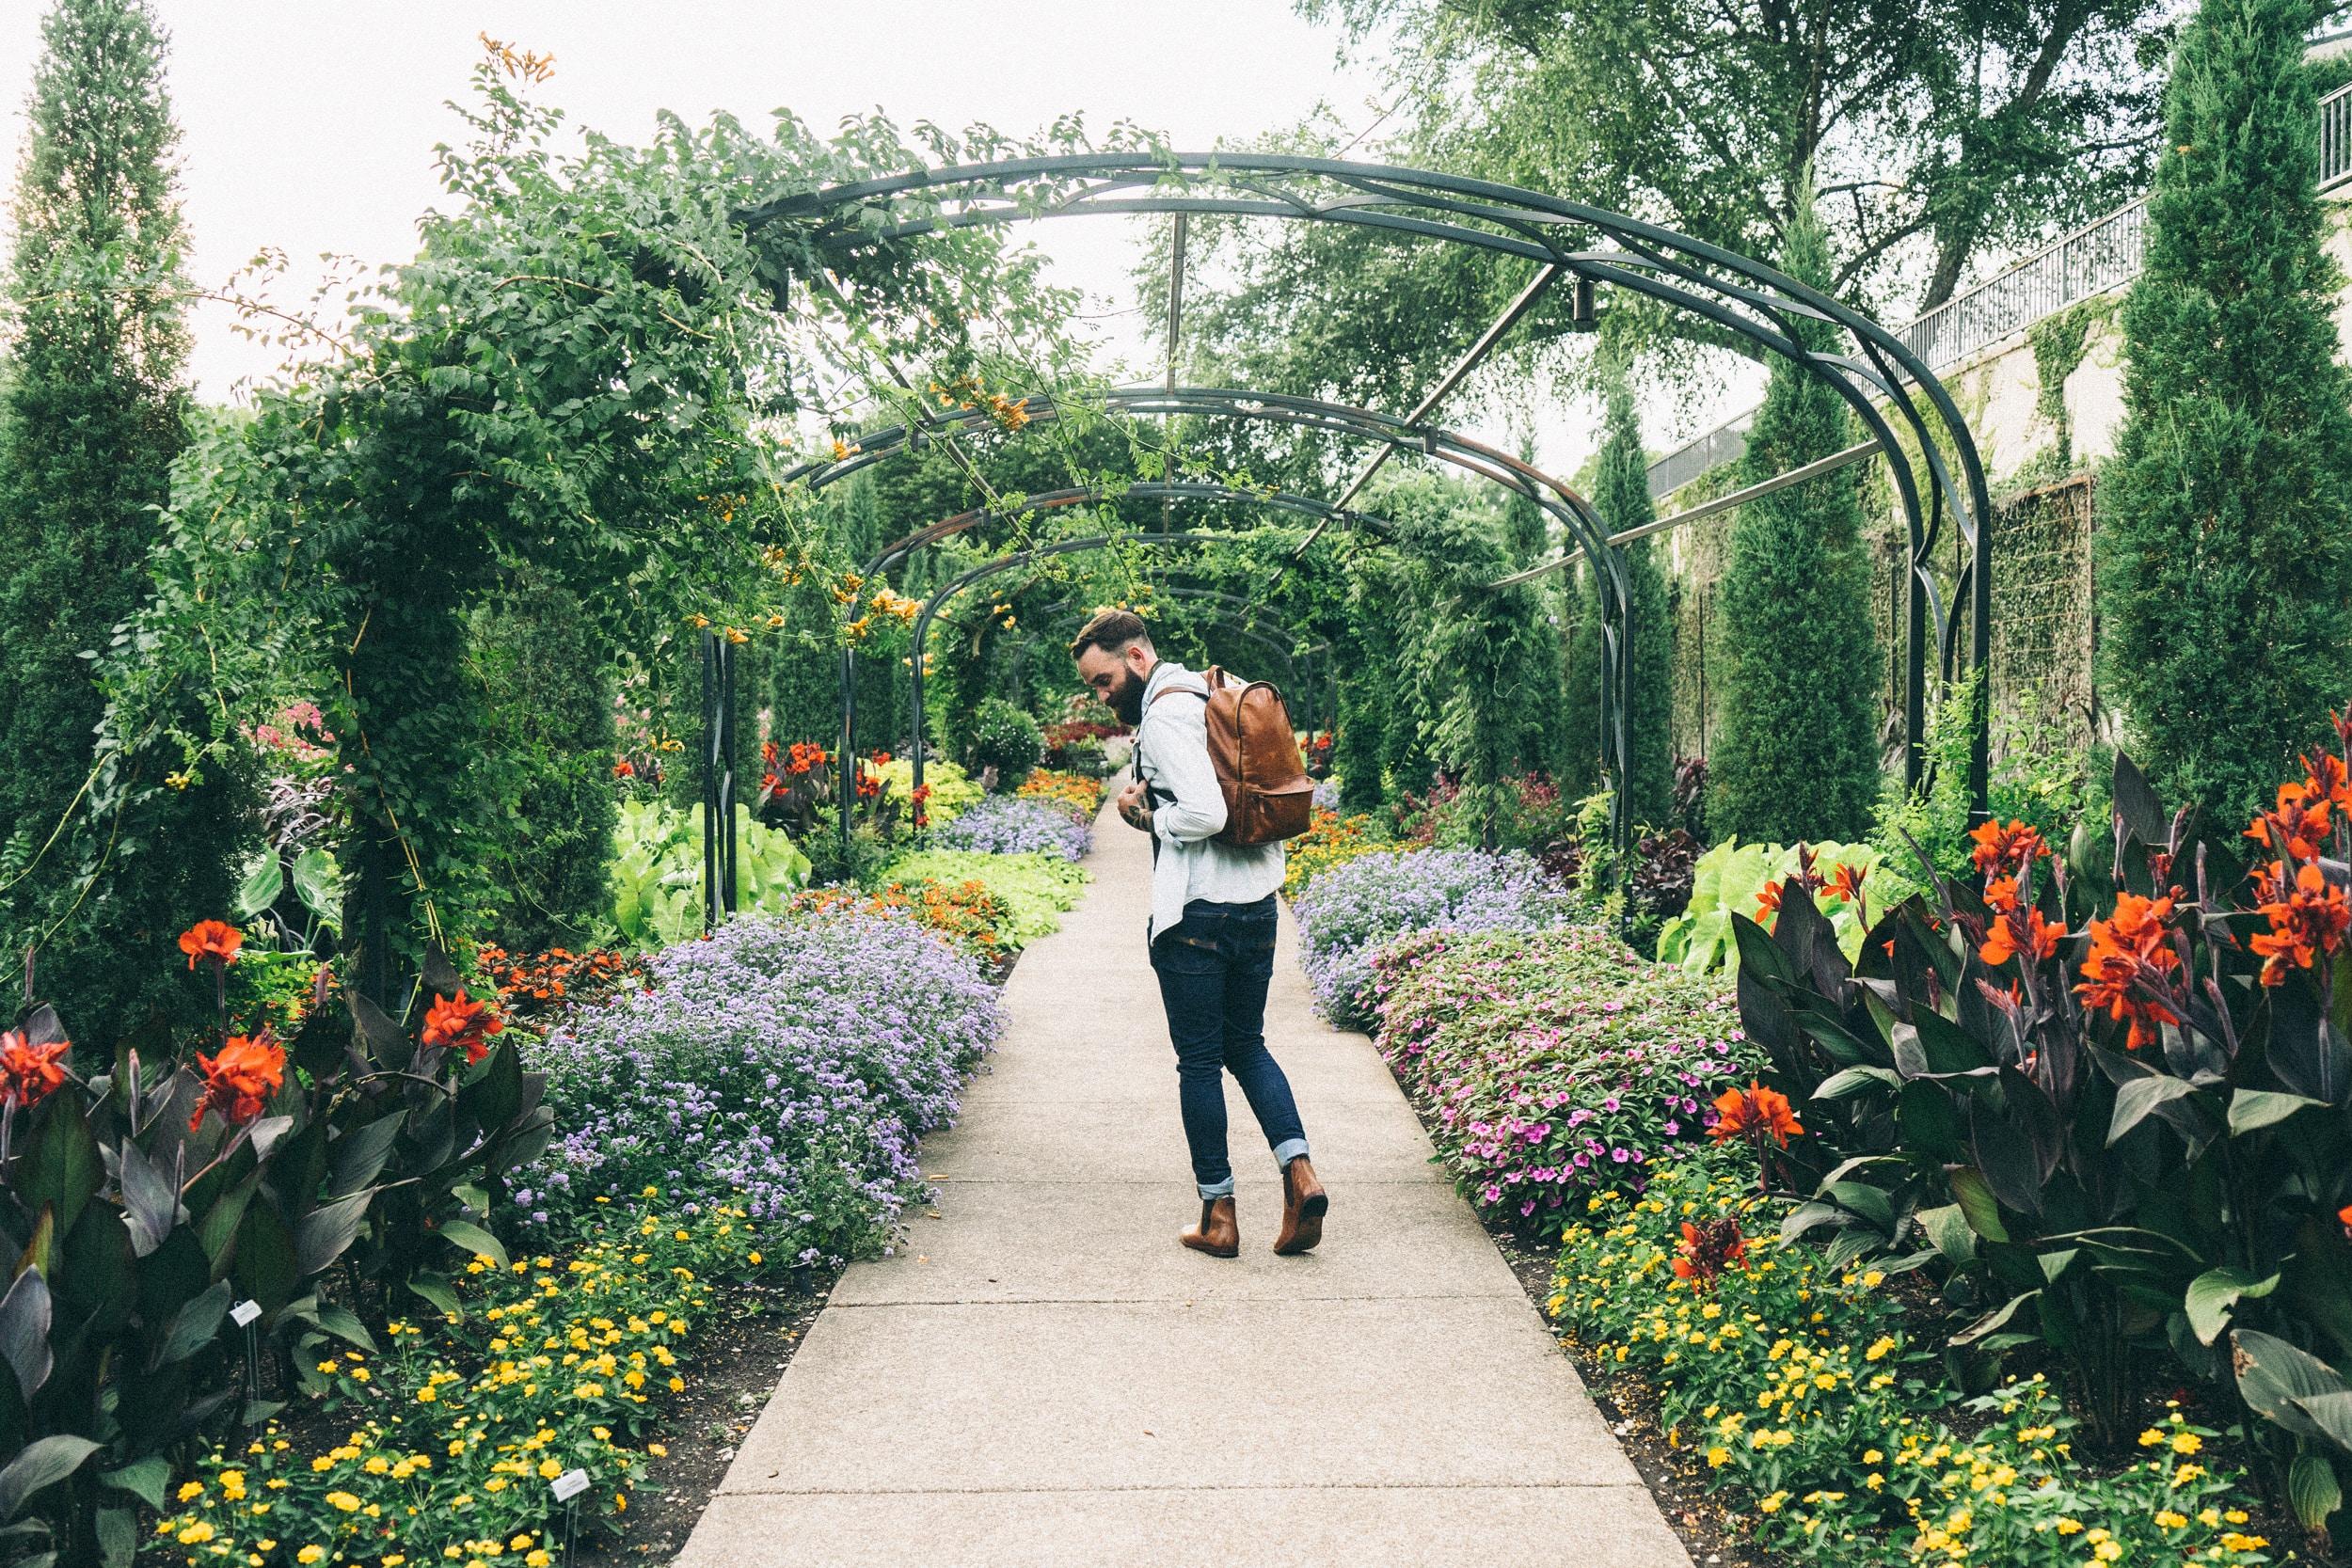 Bearded man walking through Cheekwood-Art & Gardens admiring the colorful flowers and the lush greenery